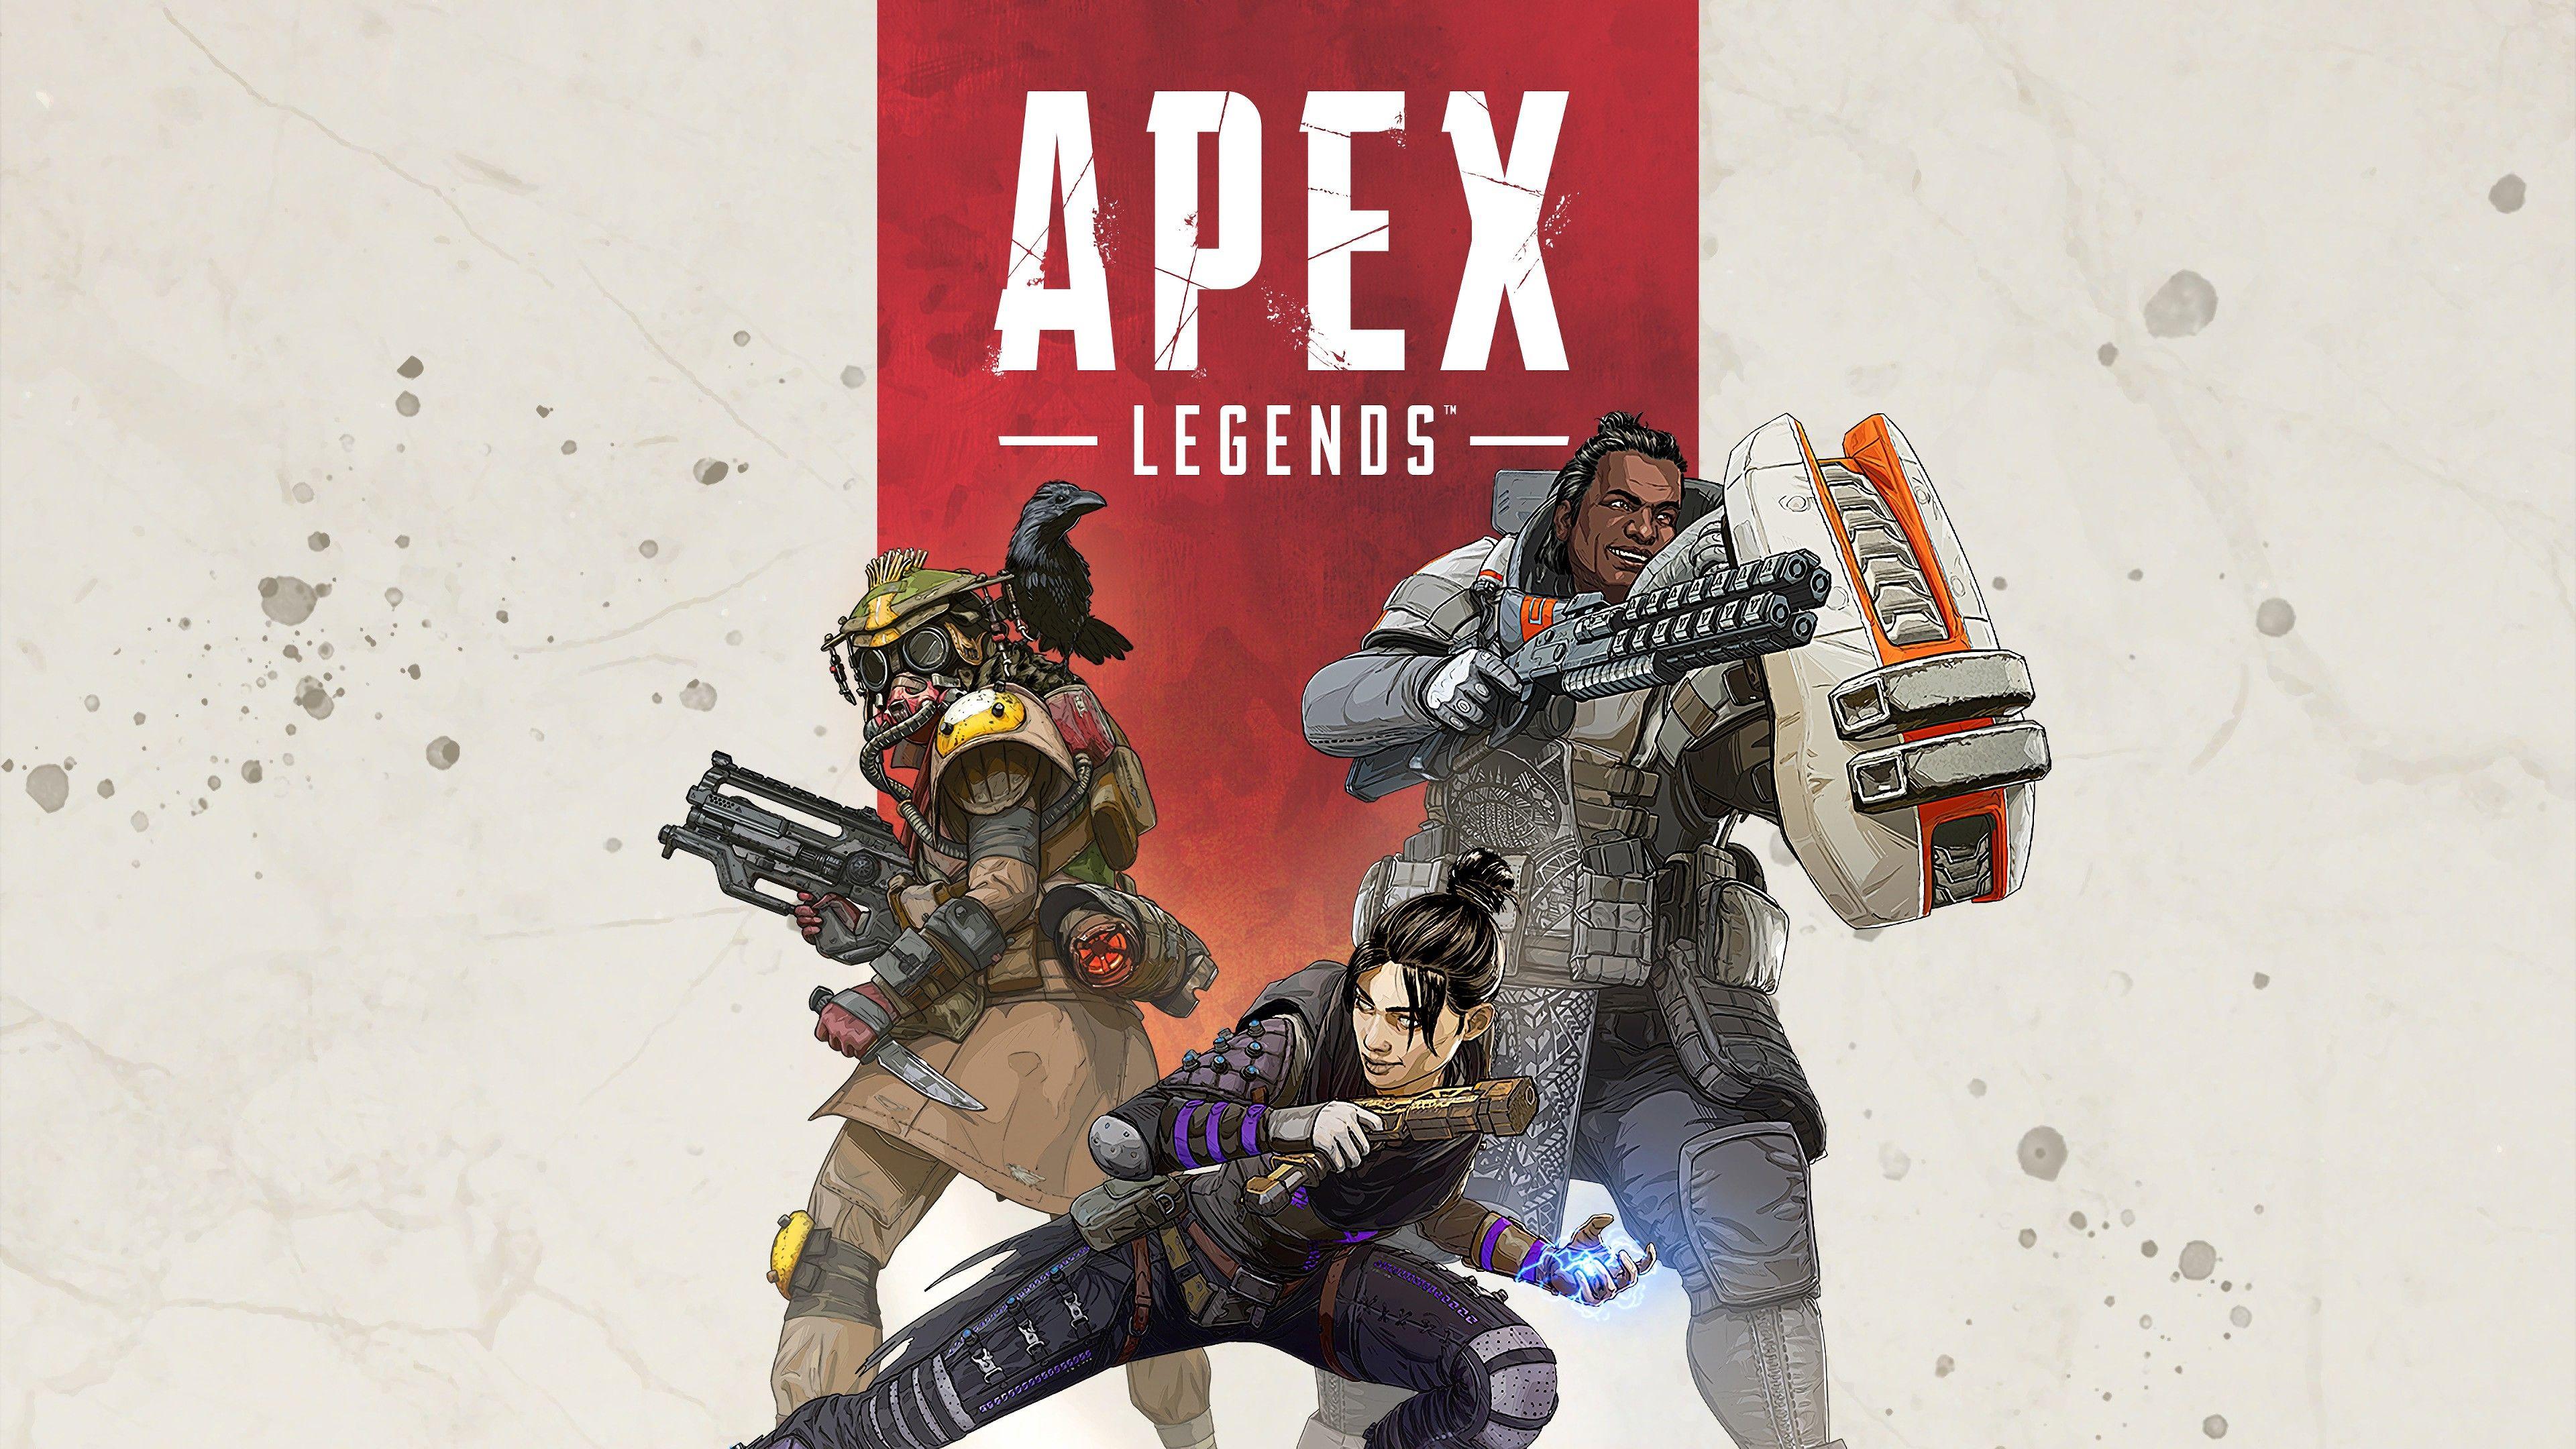 Apex Legends Poster 4k 2019 Apex Wallpaper 4k 2019 Apex Phone Wallpaper Hd 4k Apex Legends Wallpaper Phone Titanfall Battle Royale Game Character Wallpaper